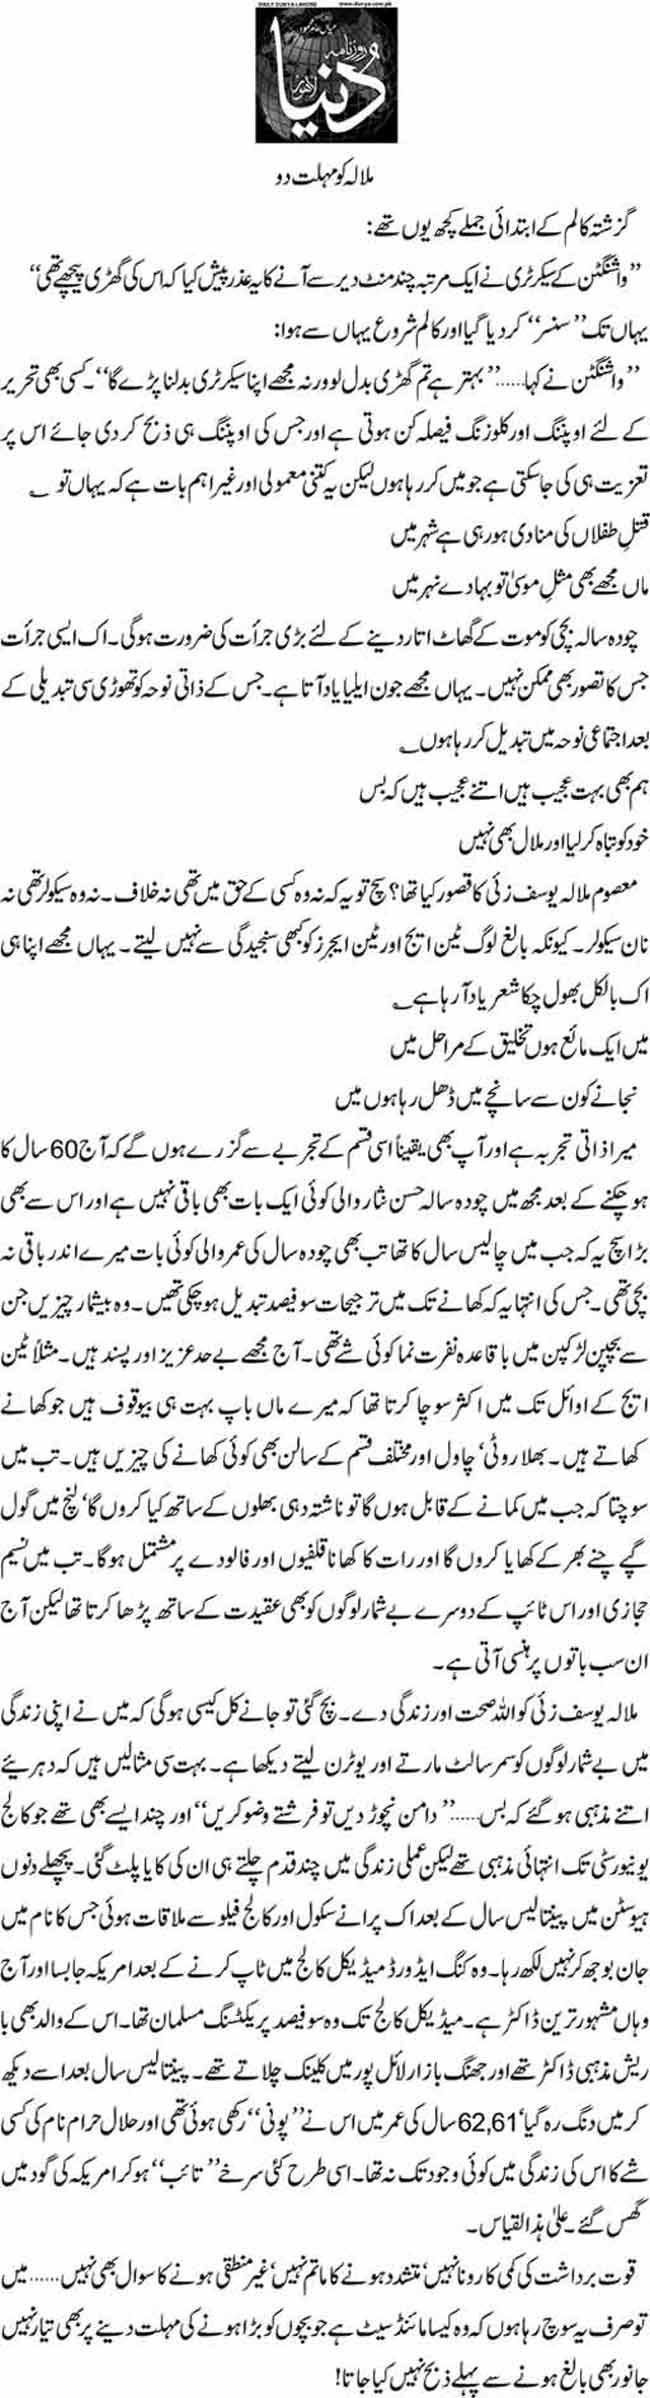 Malala ko muhlat do - Hassan Nisar